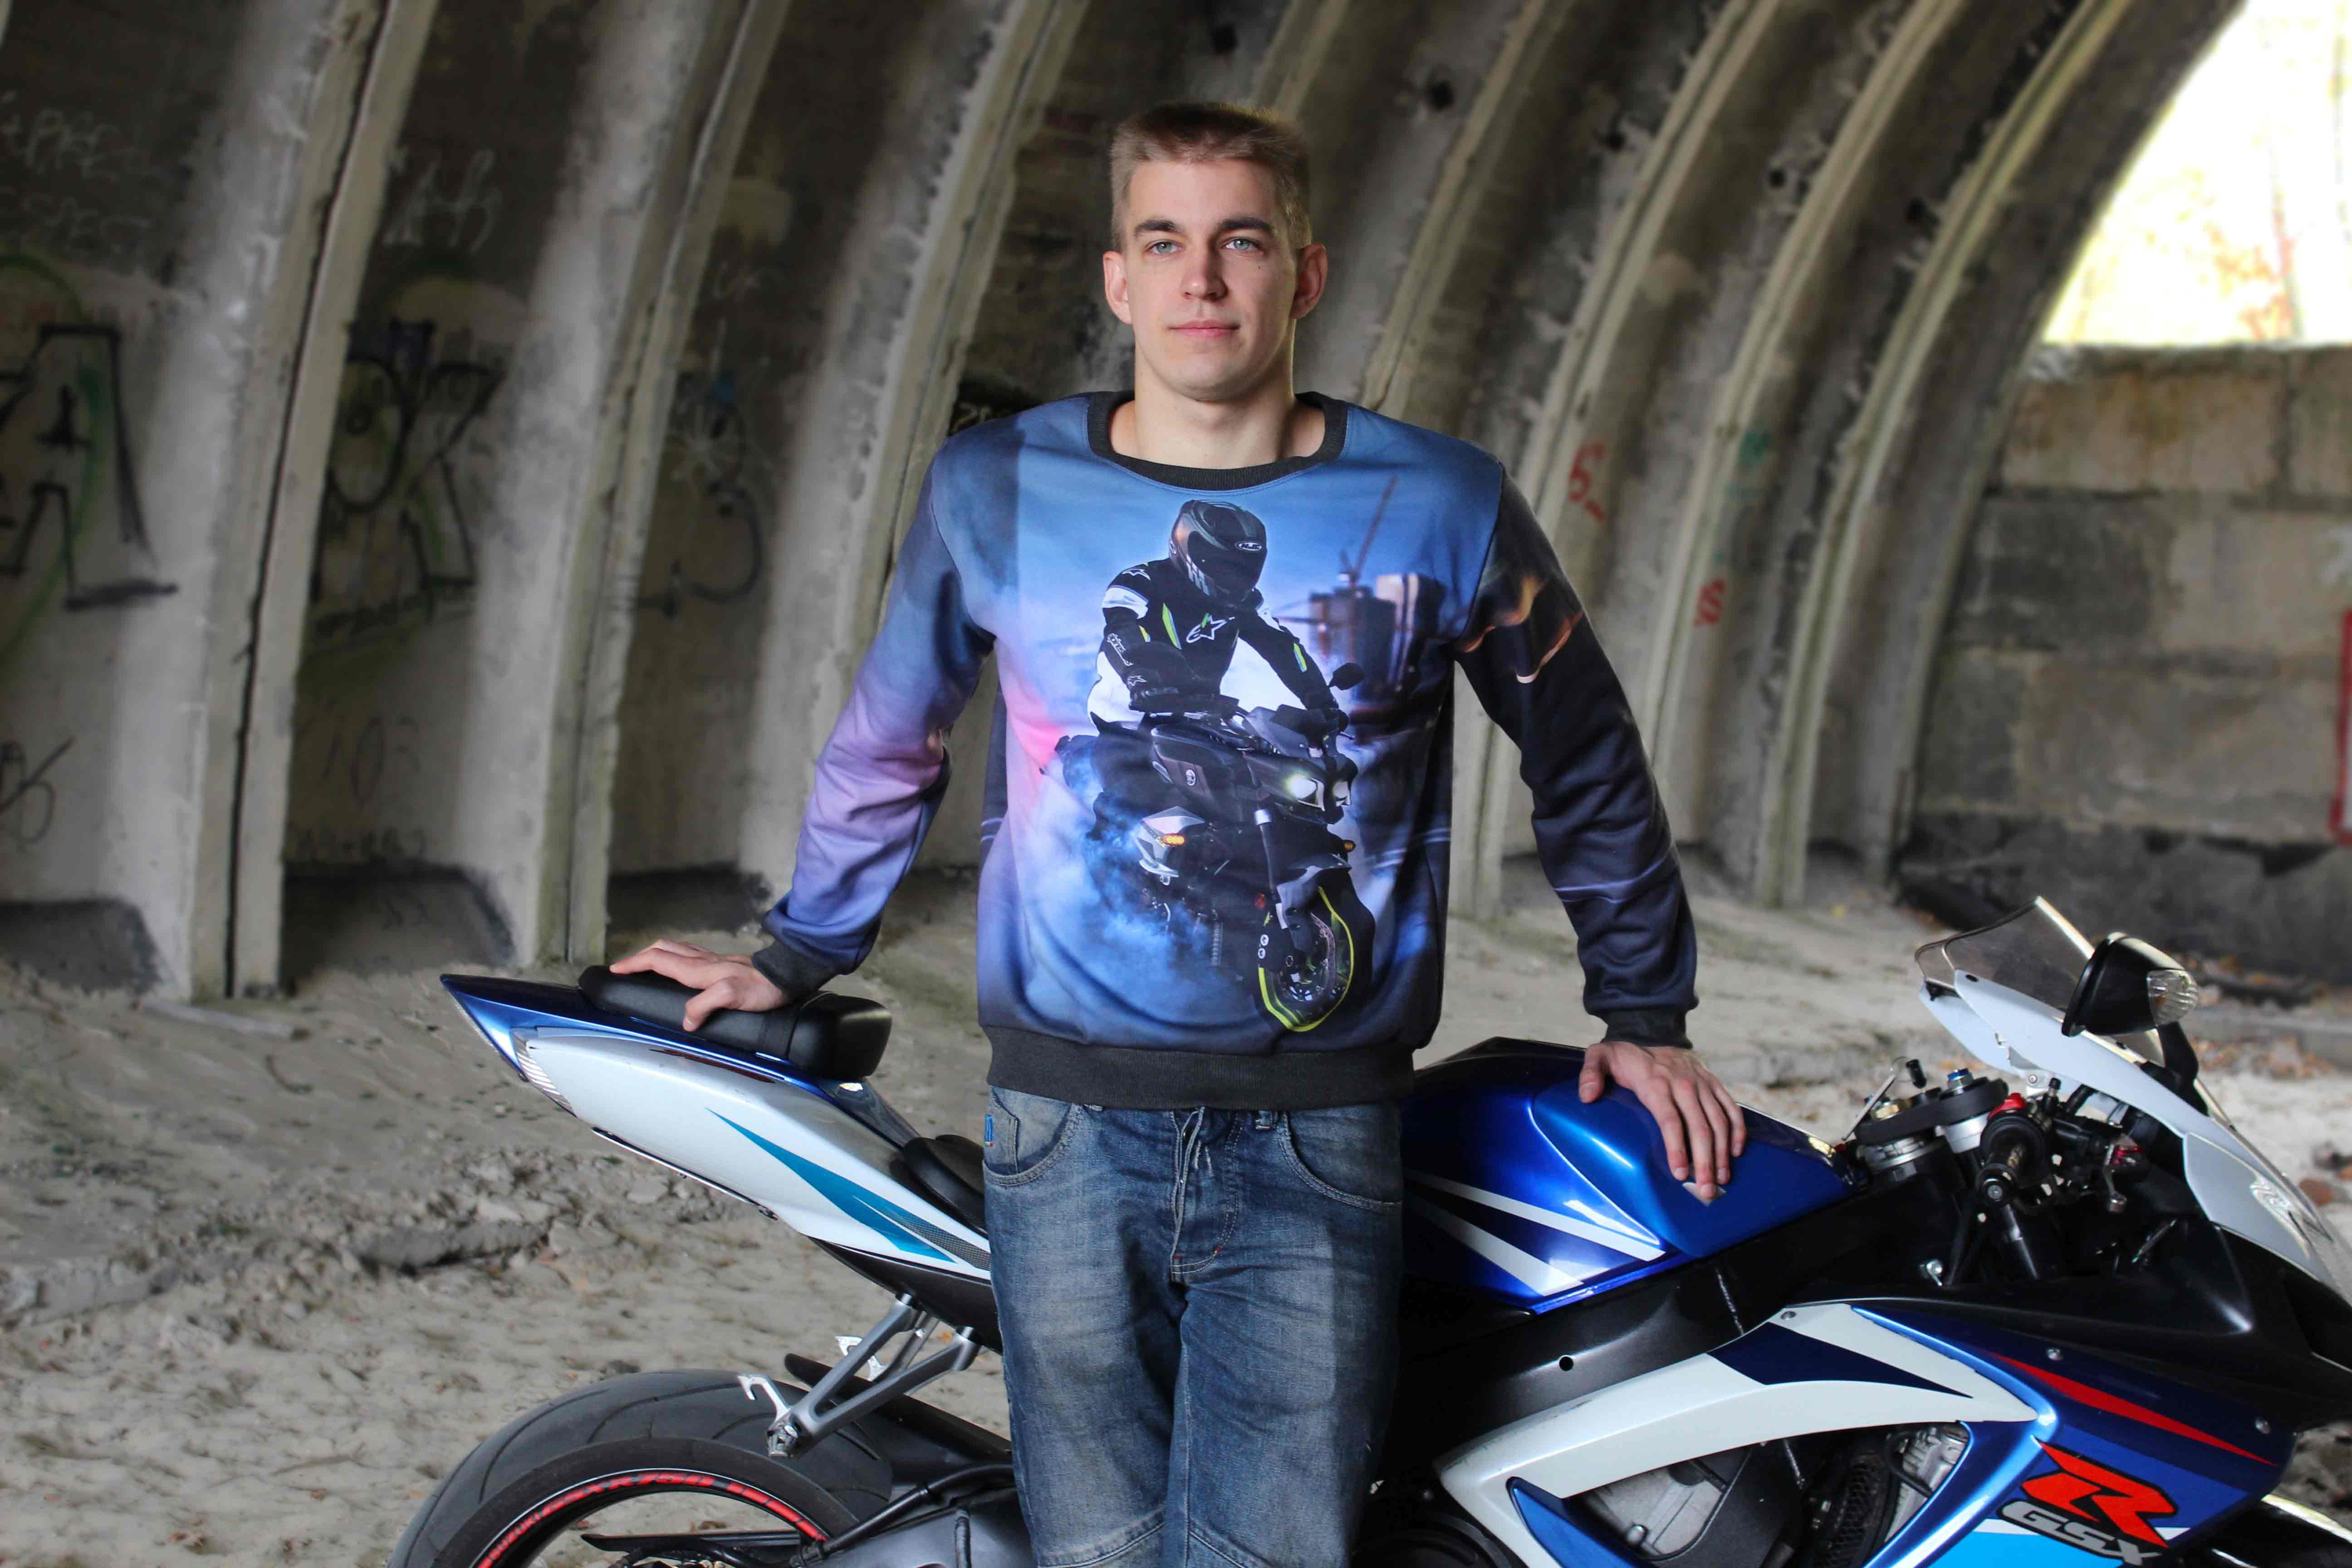 КОФТА 4Y PRINT  Артмото - купить квадроцикл в украине и харькове, мотоцикл, снегоход, скутер, мопед, электромобиль